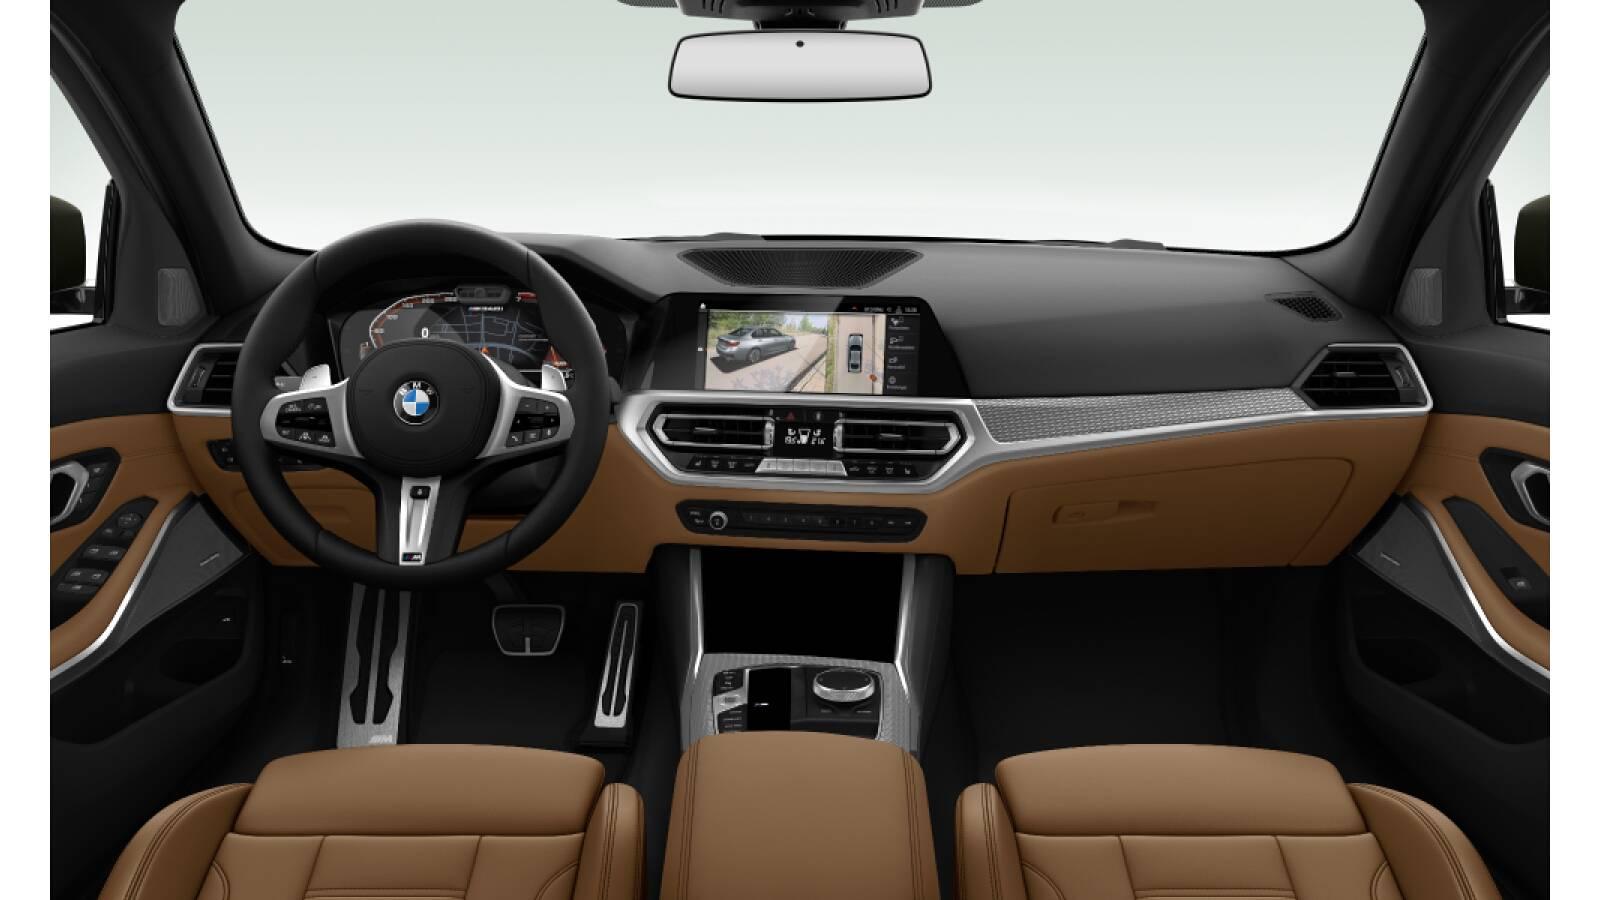 BMW 3 Series 2019 leaked photos (31)